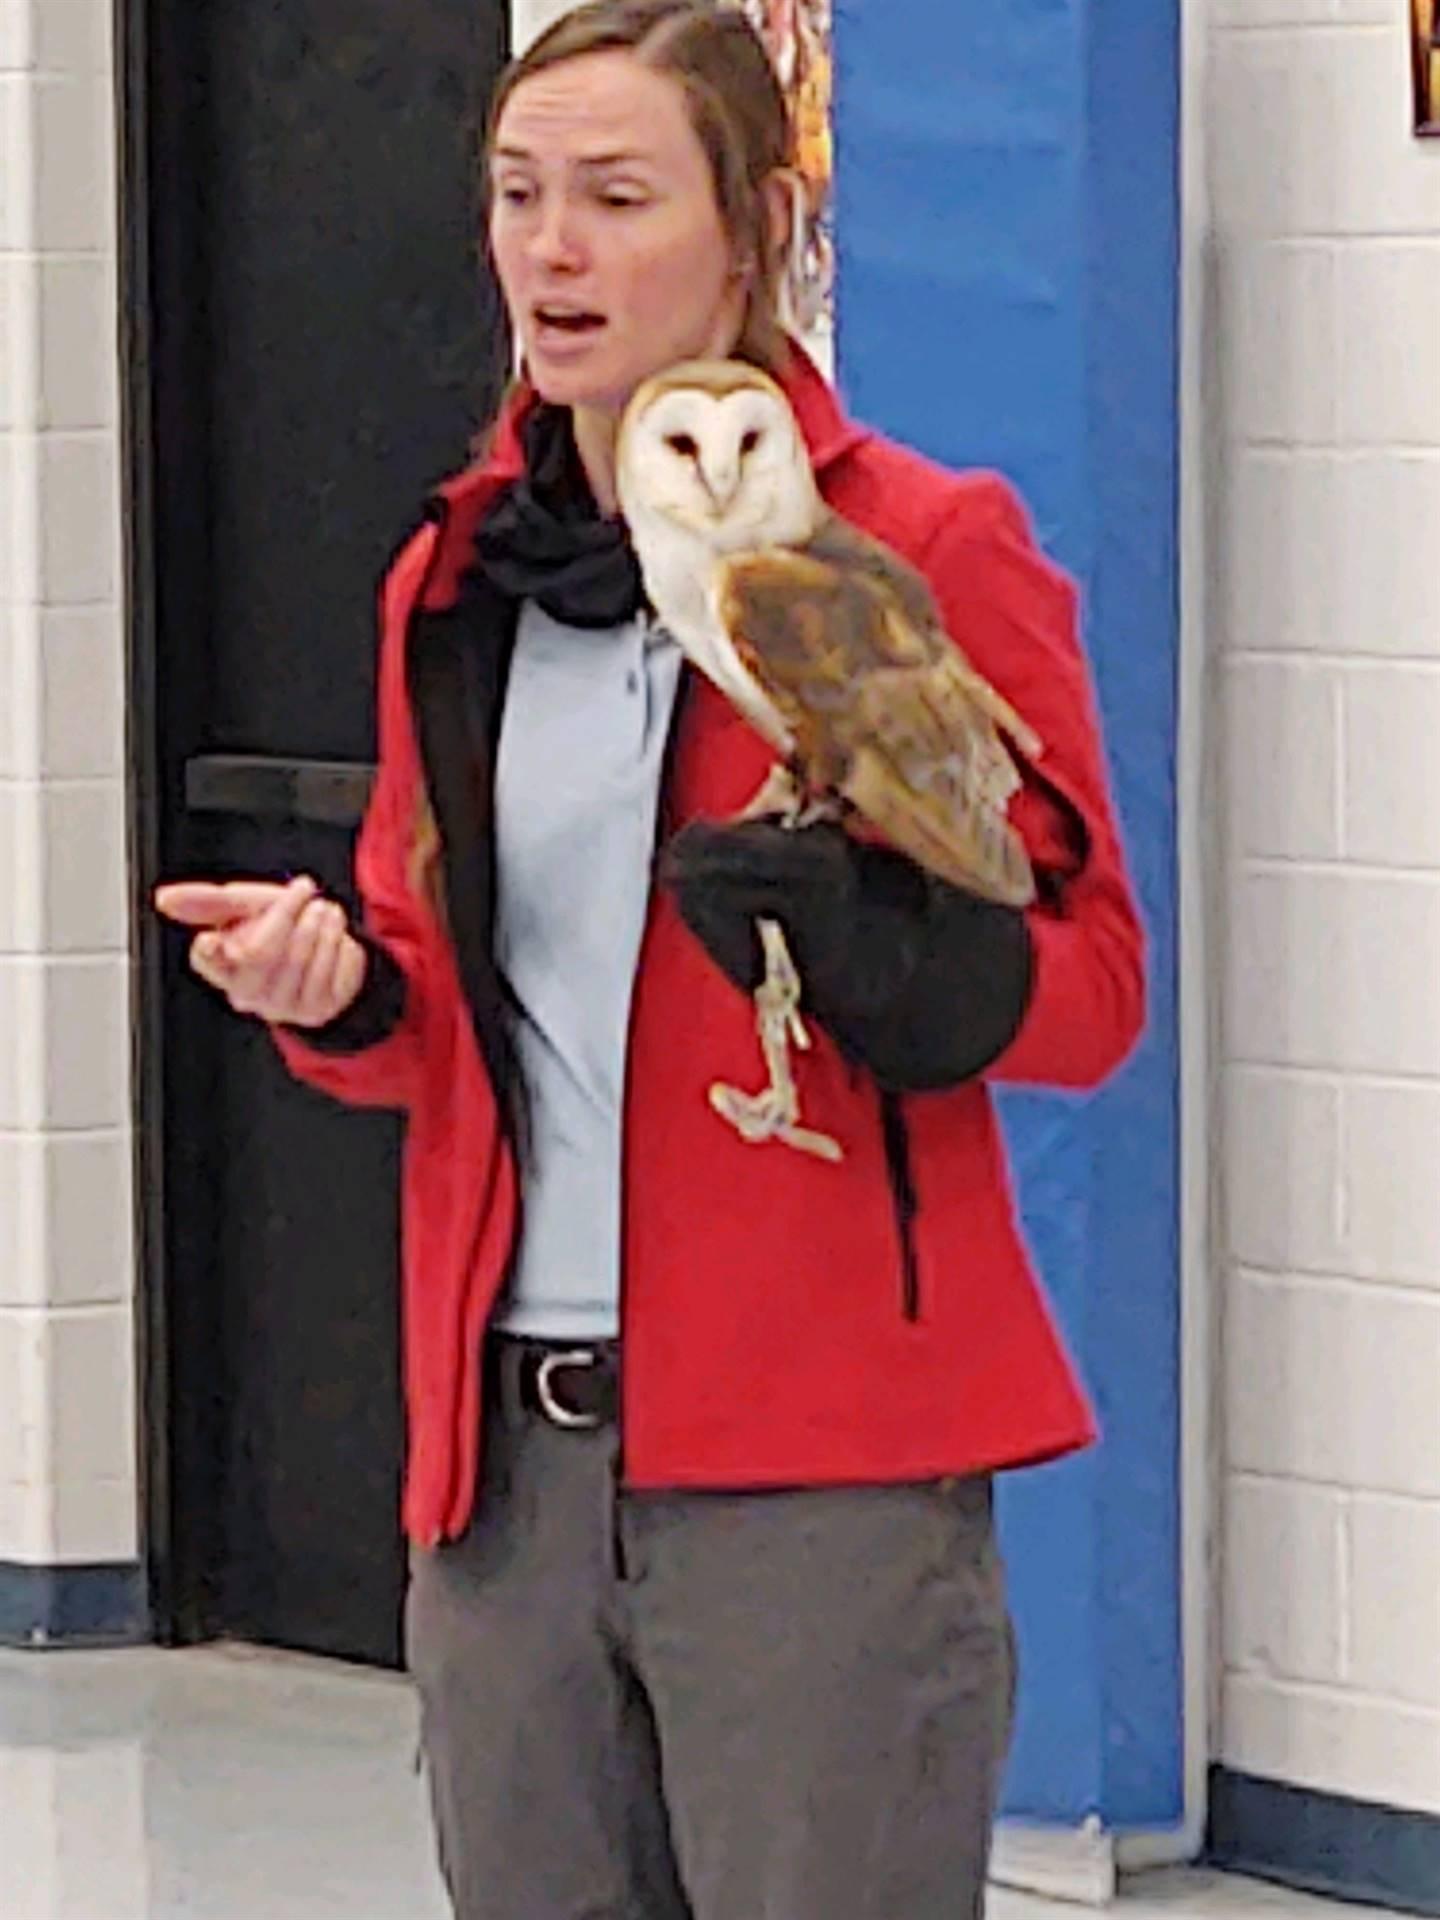 We got to meet Monte, the Barn Owl